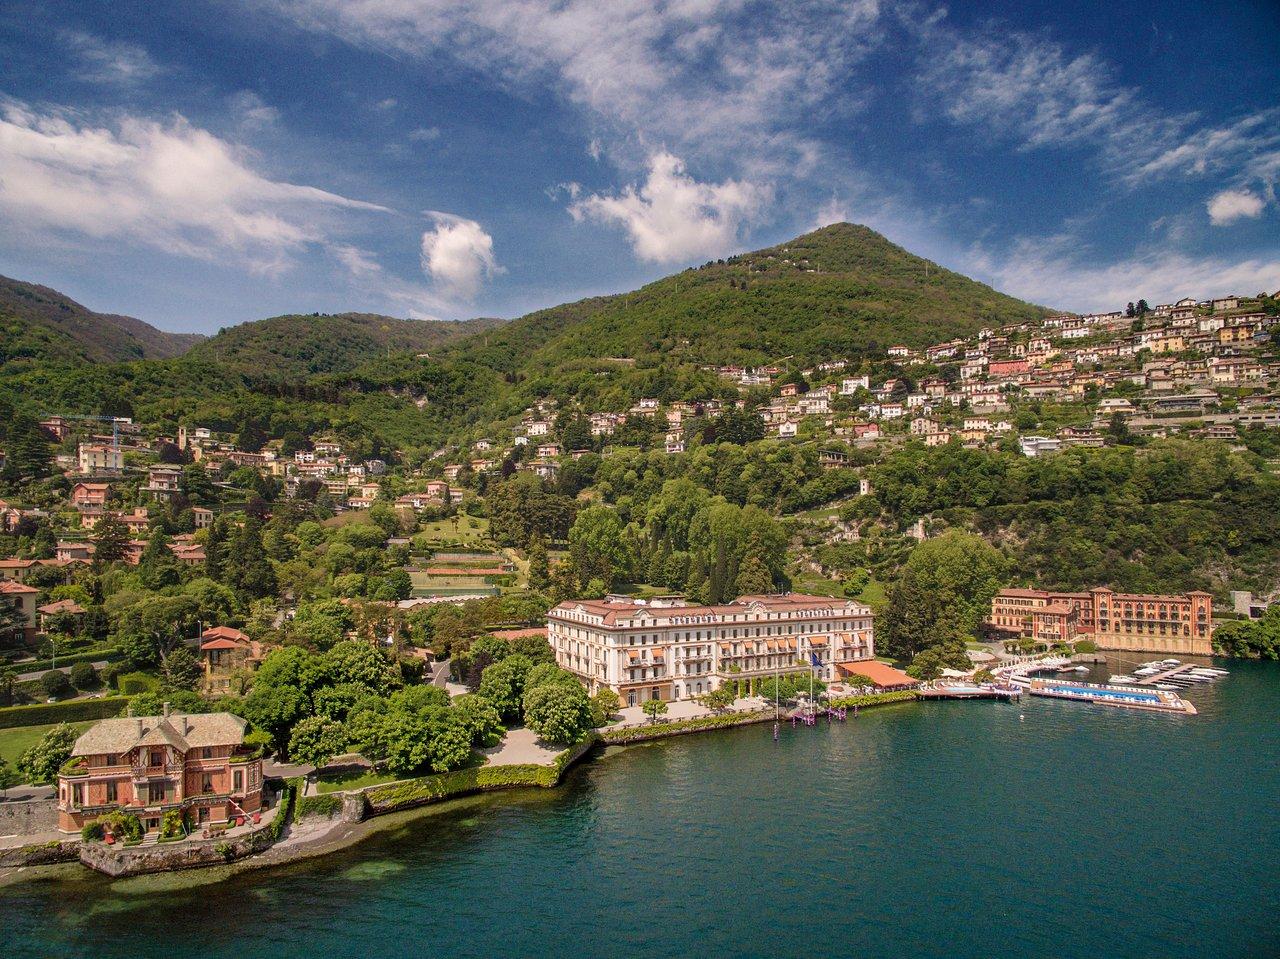 I MIGLIORI 10 hotel a Cernobbio nel 2019 (da 51 €) - TripAdvisor